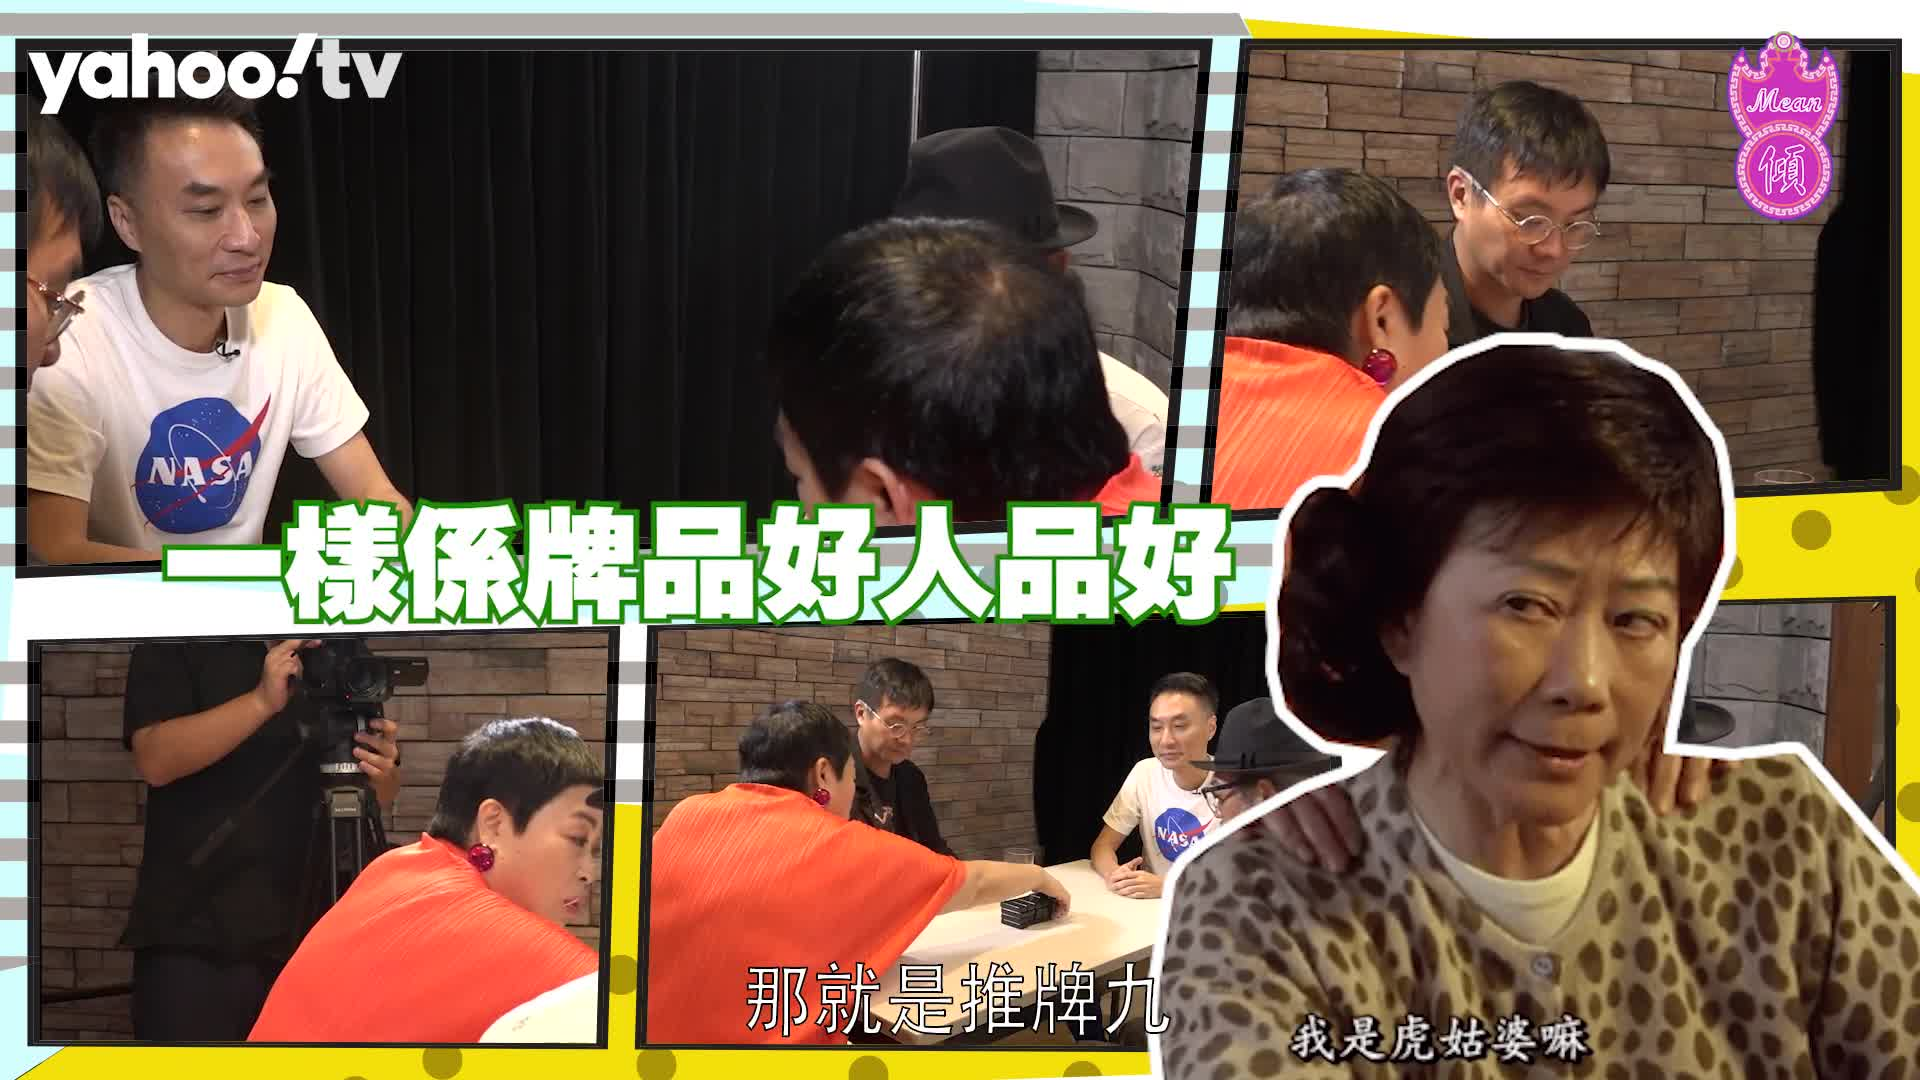 【Mean傾 第四季】盧覓雪 x 梁栢堅 #文化亂入crossover MC仁係宣傳天九大使?